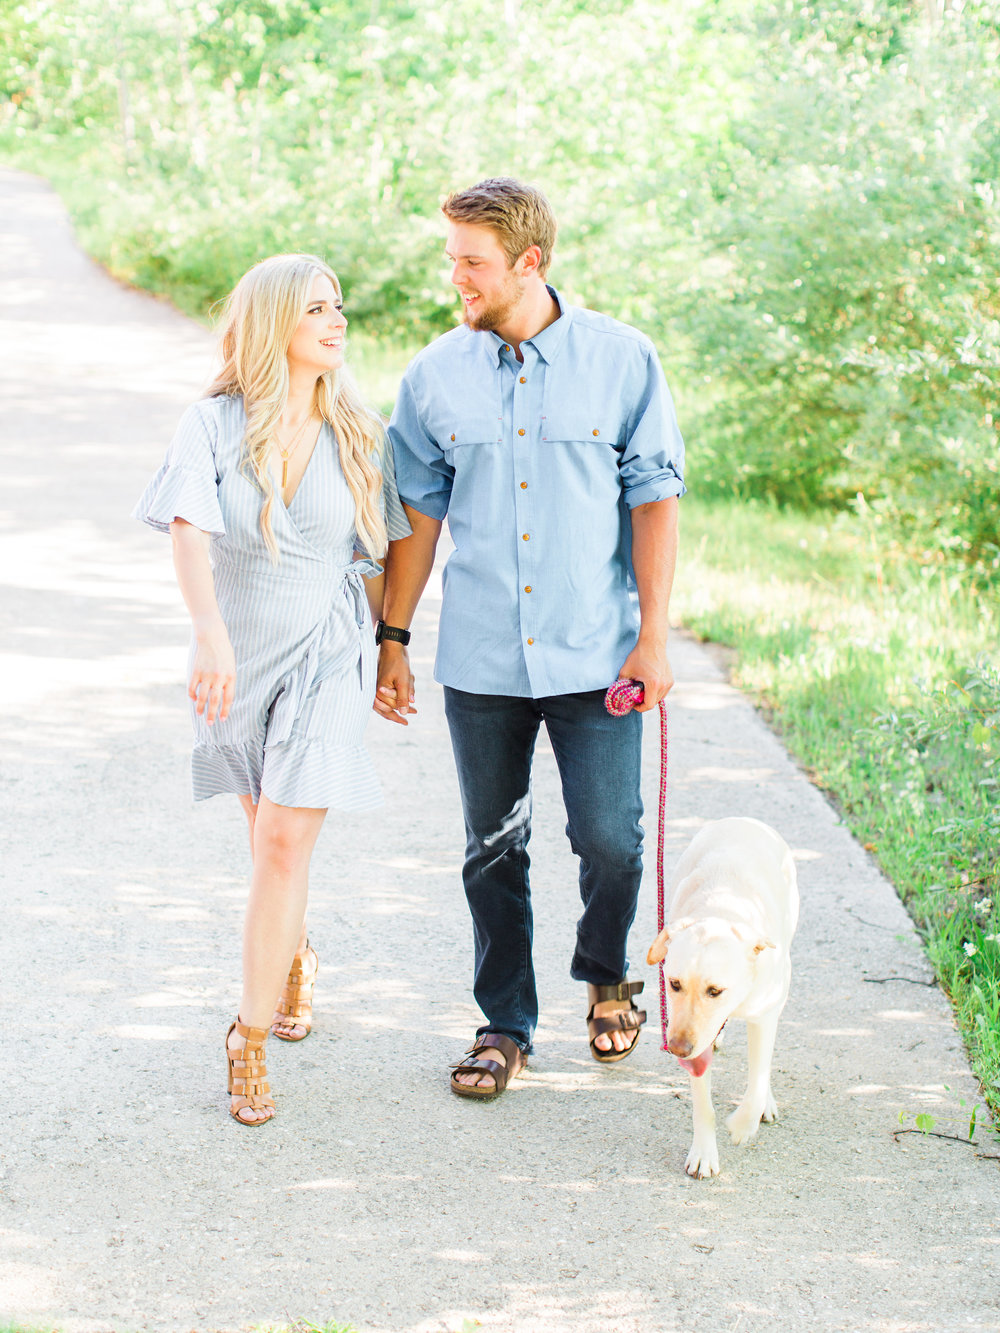 Hannah+Kyle+Engaged-16.jpg